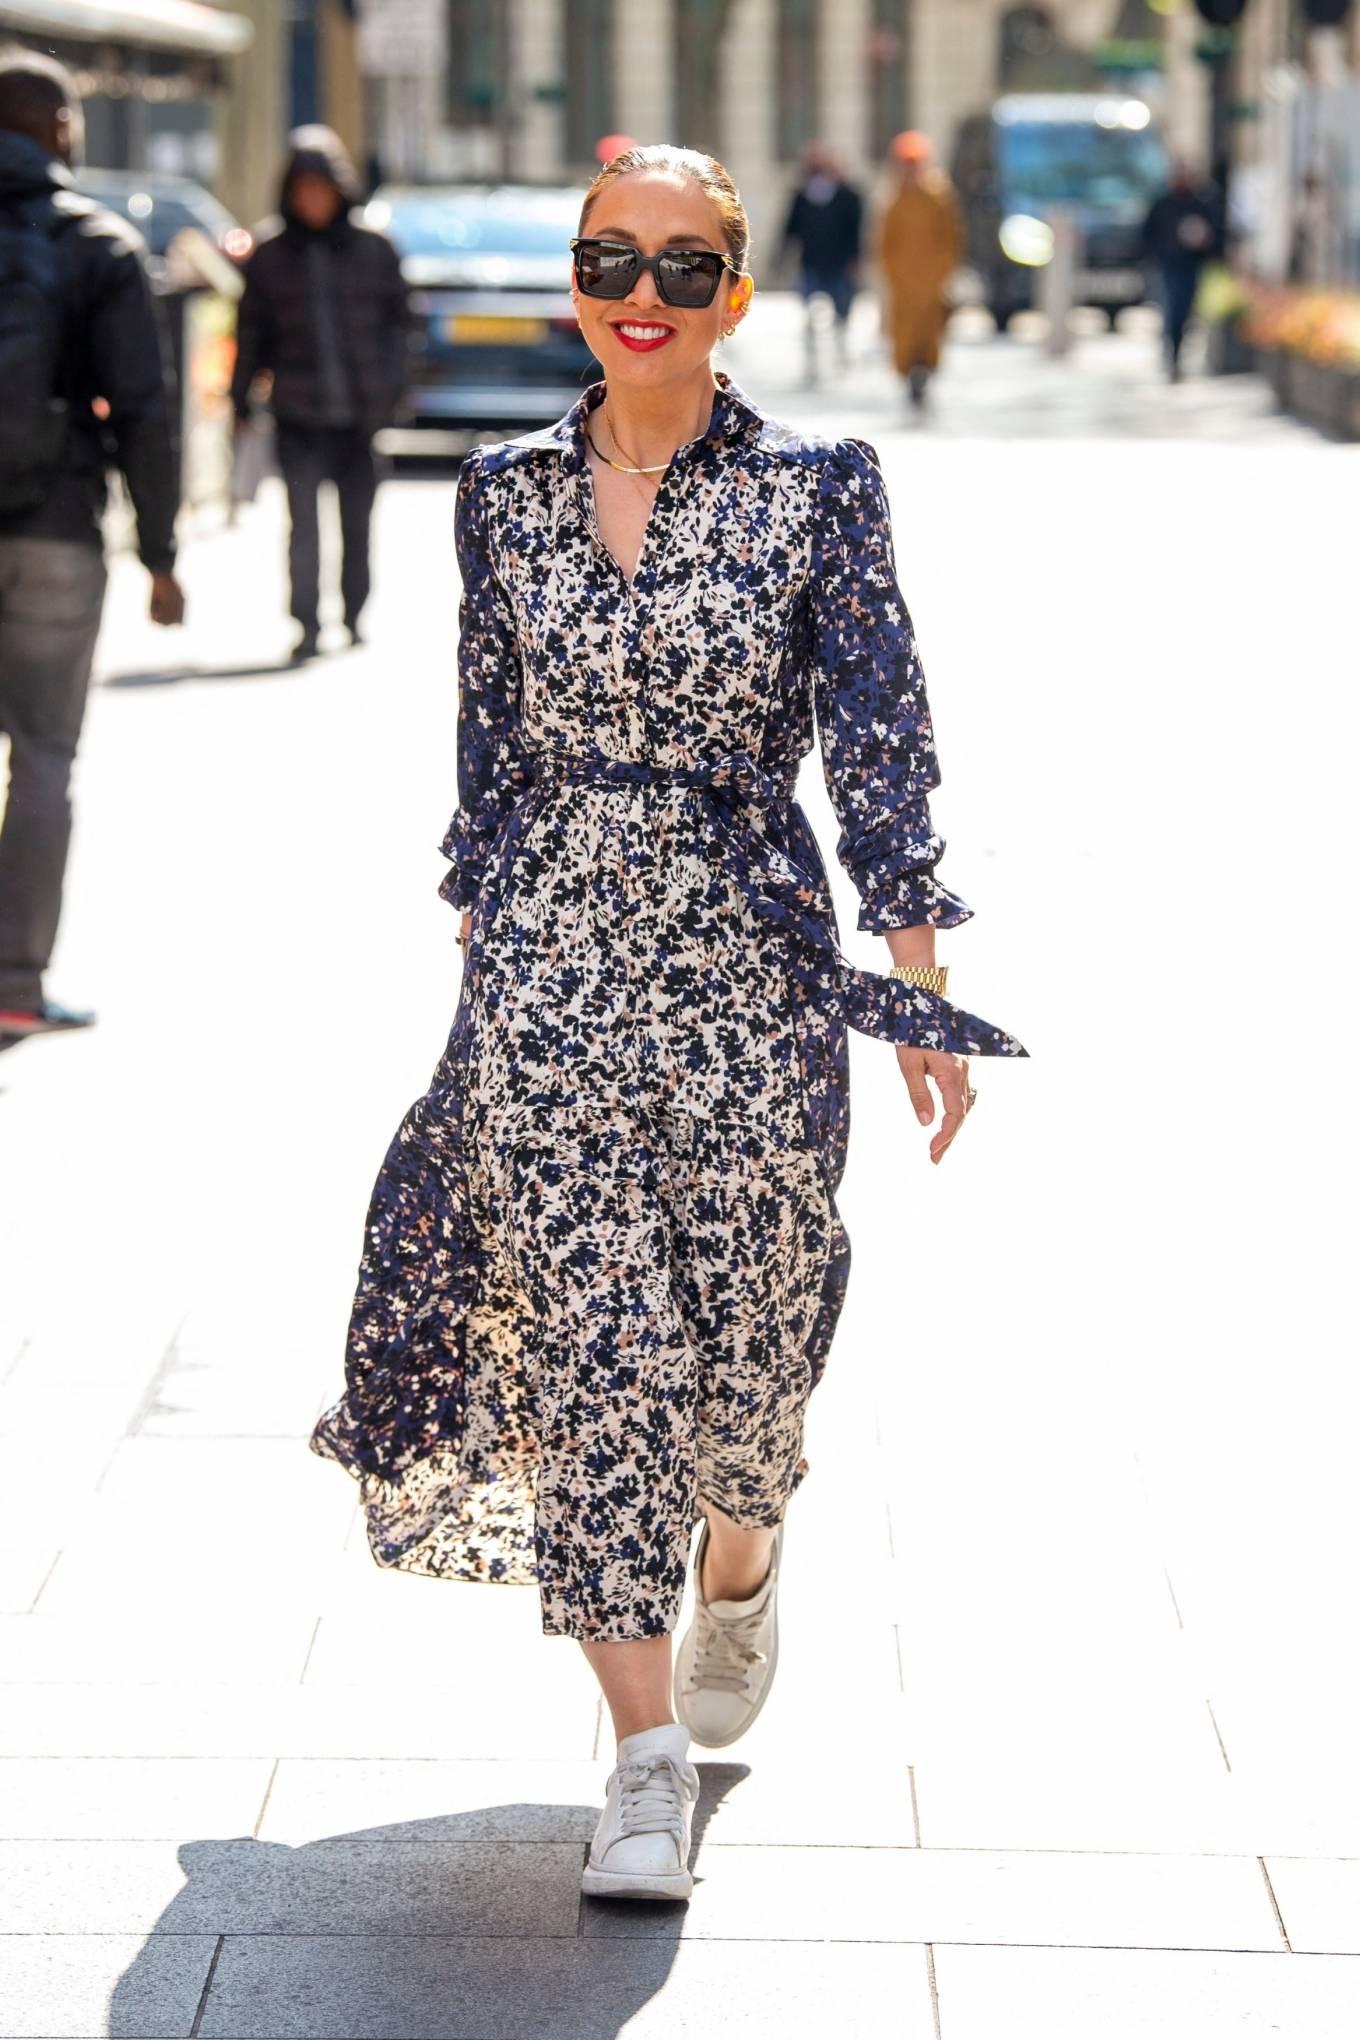 Myleene Klass 2021 : Myleene Klass – In a long summer dress arriving at the Global studios -18